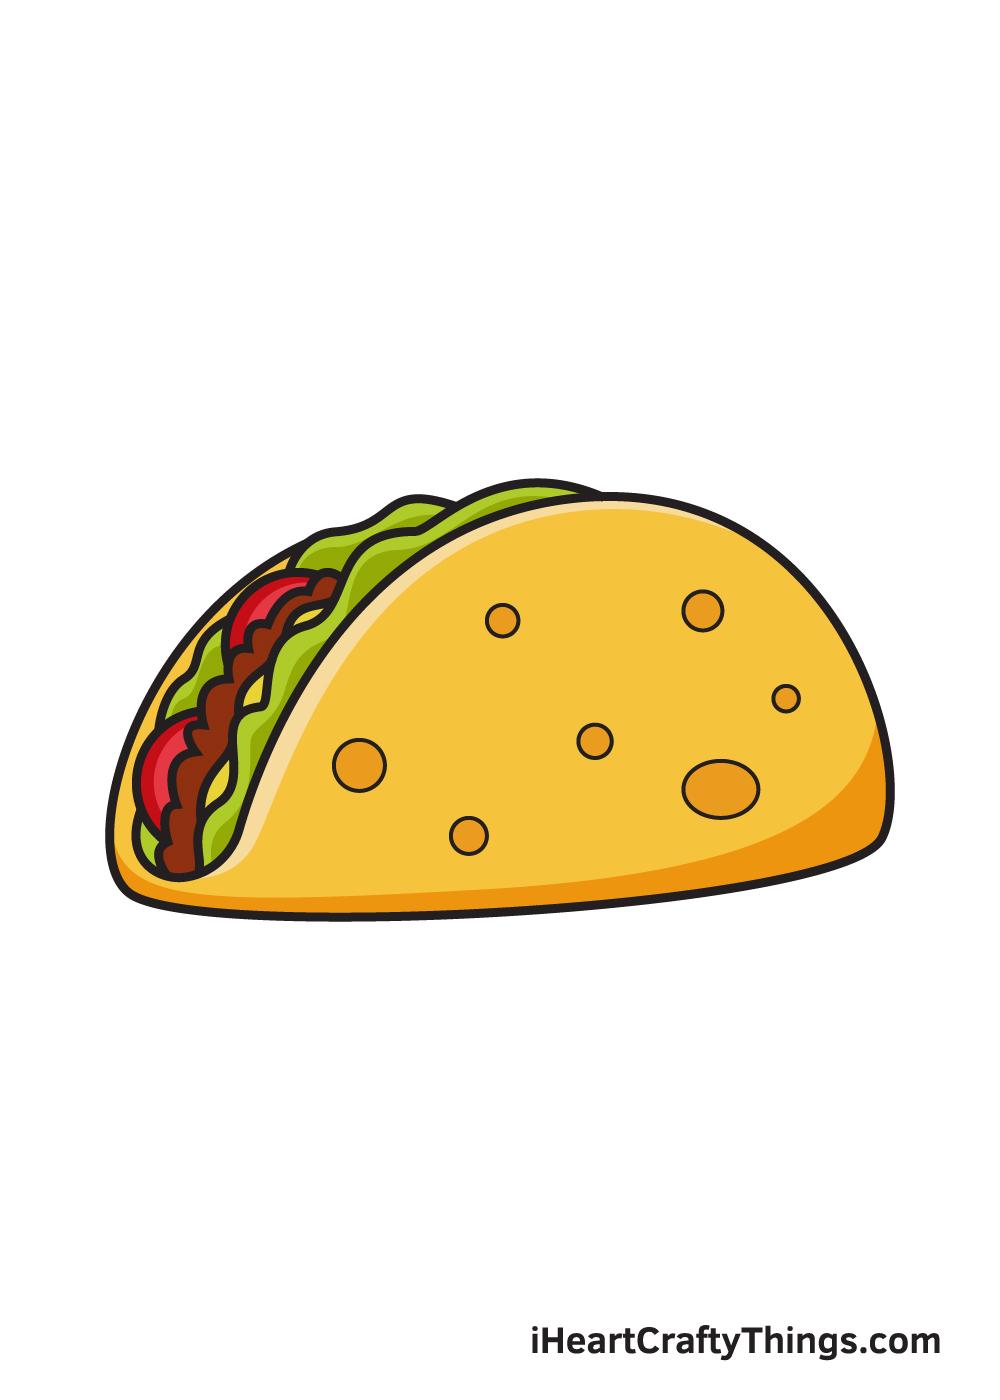 taco drawing 9 steps